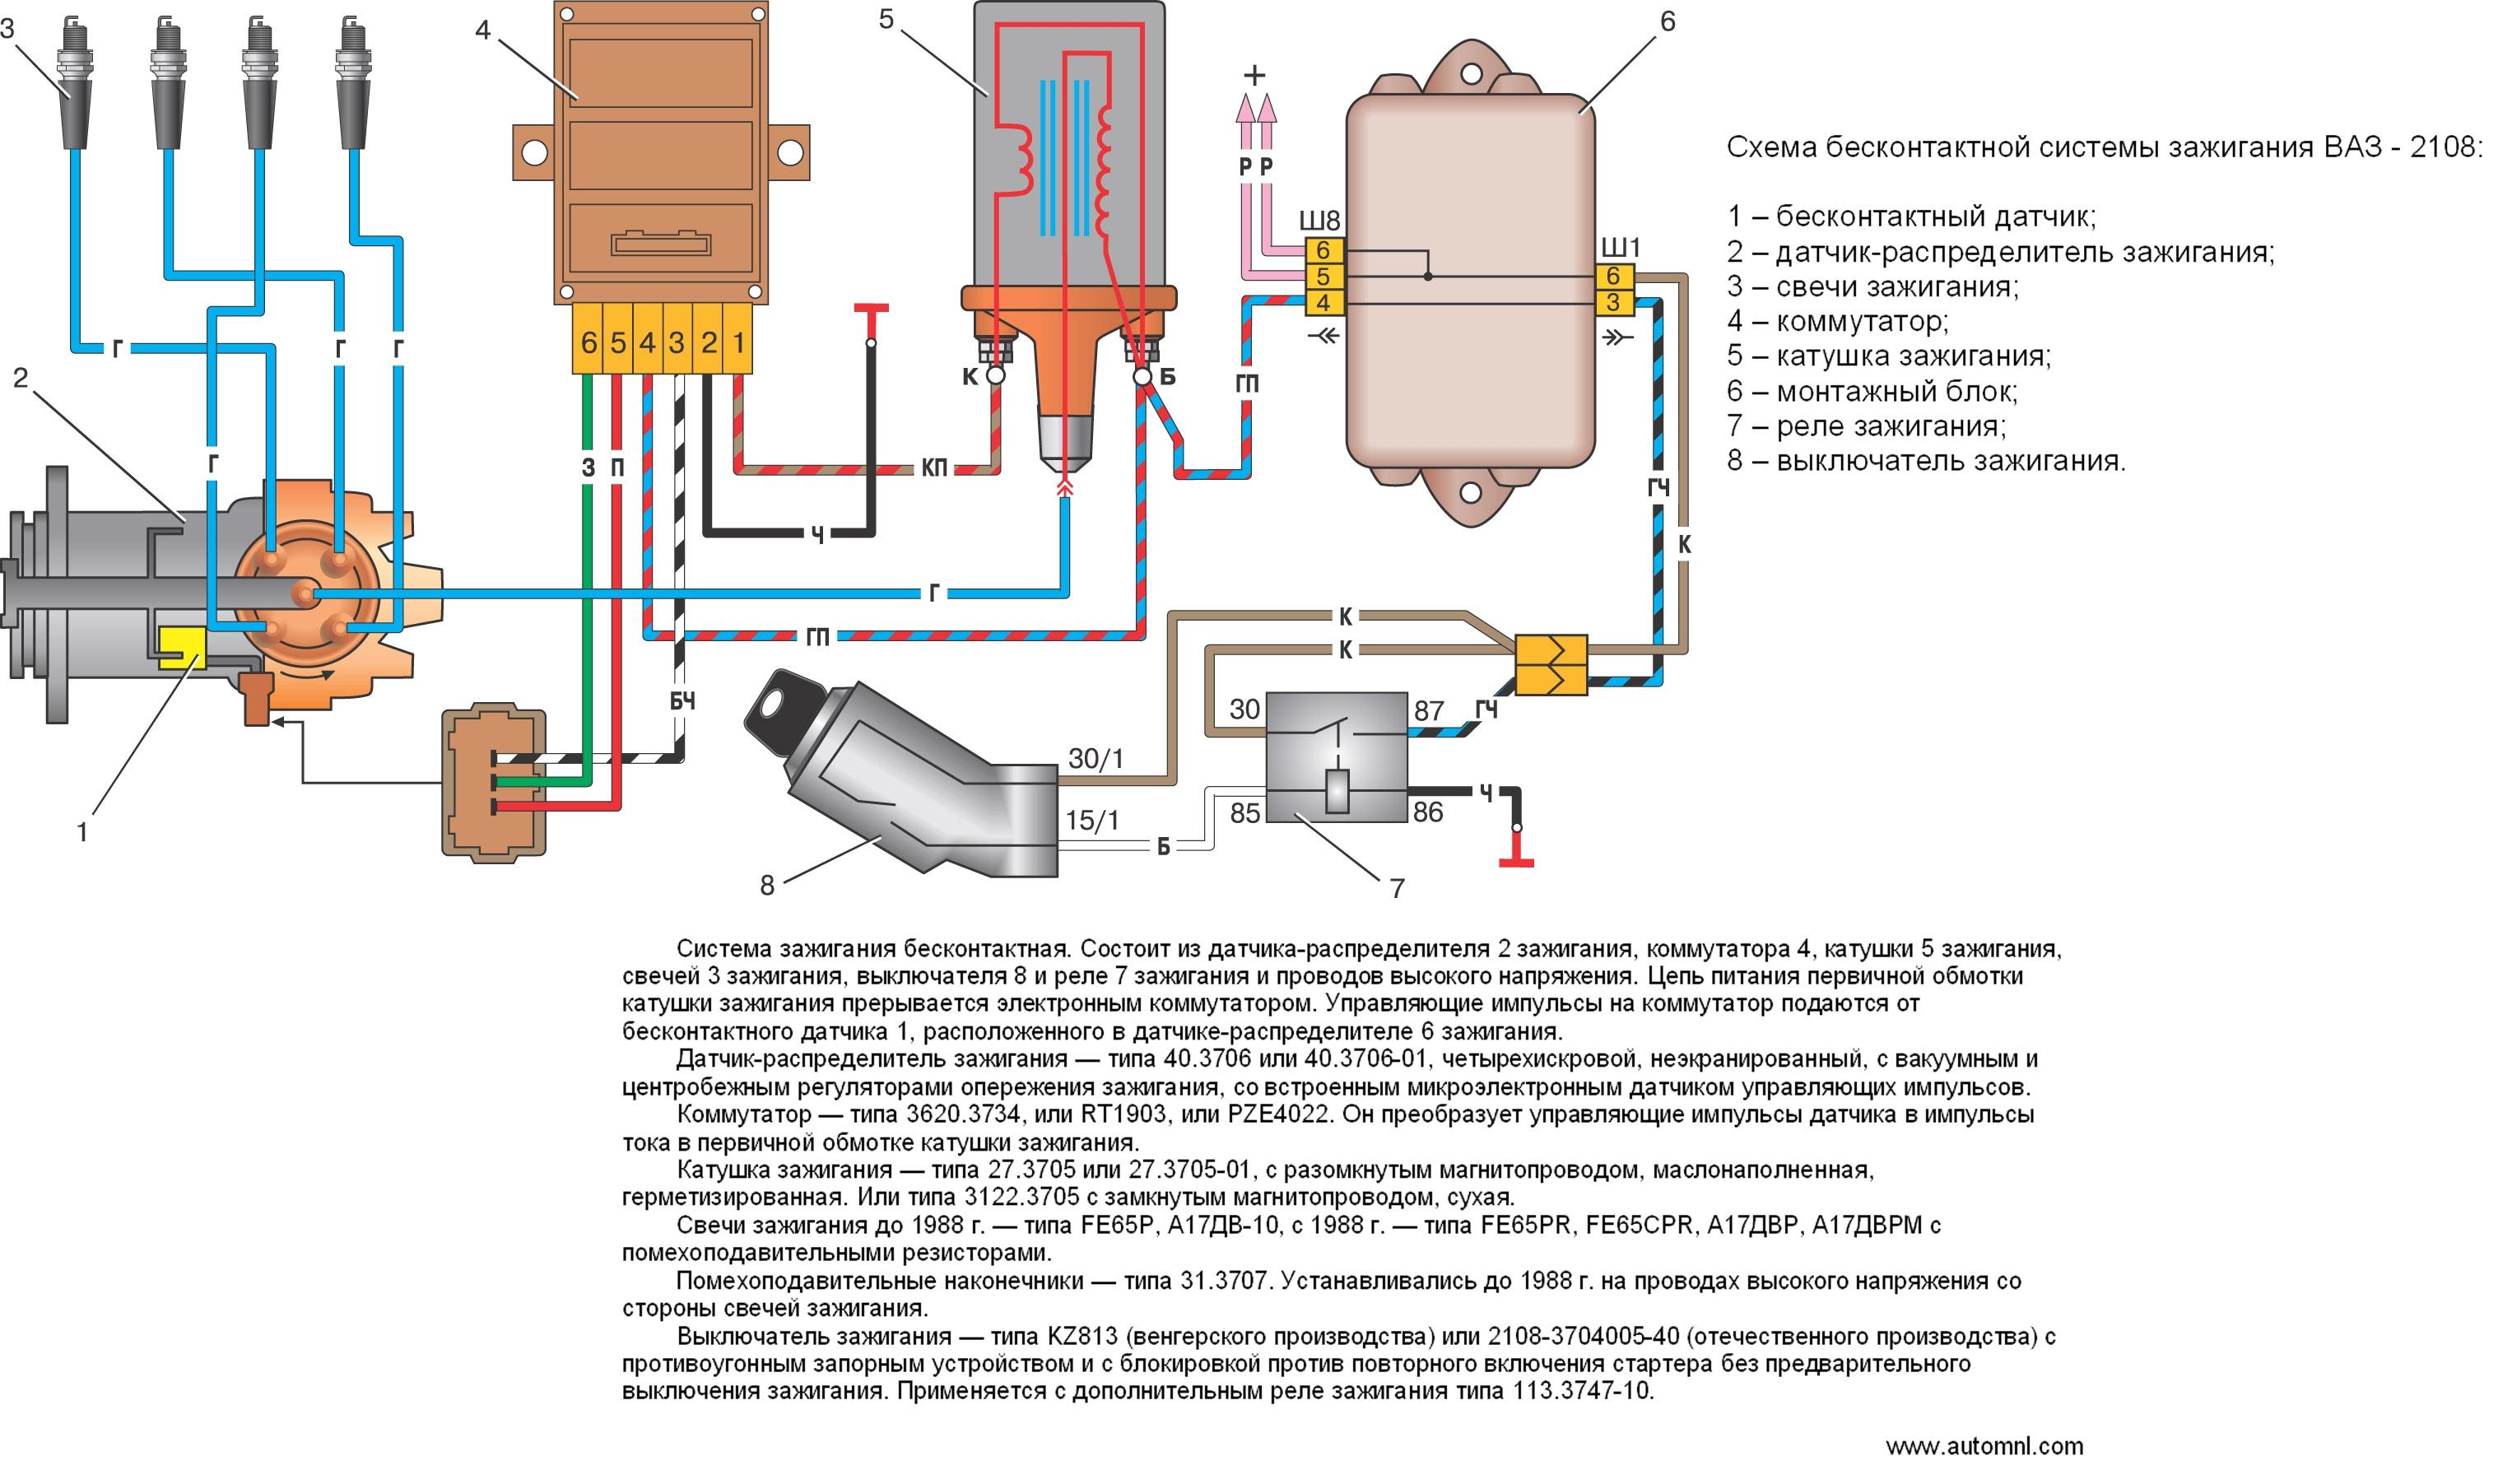 Схема прибора проверки катушки зажигания